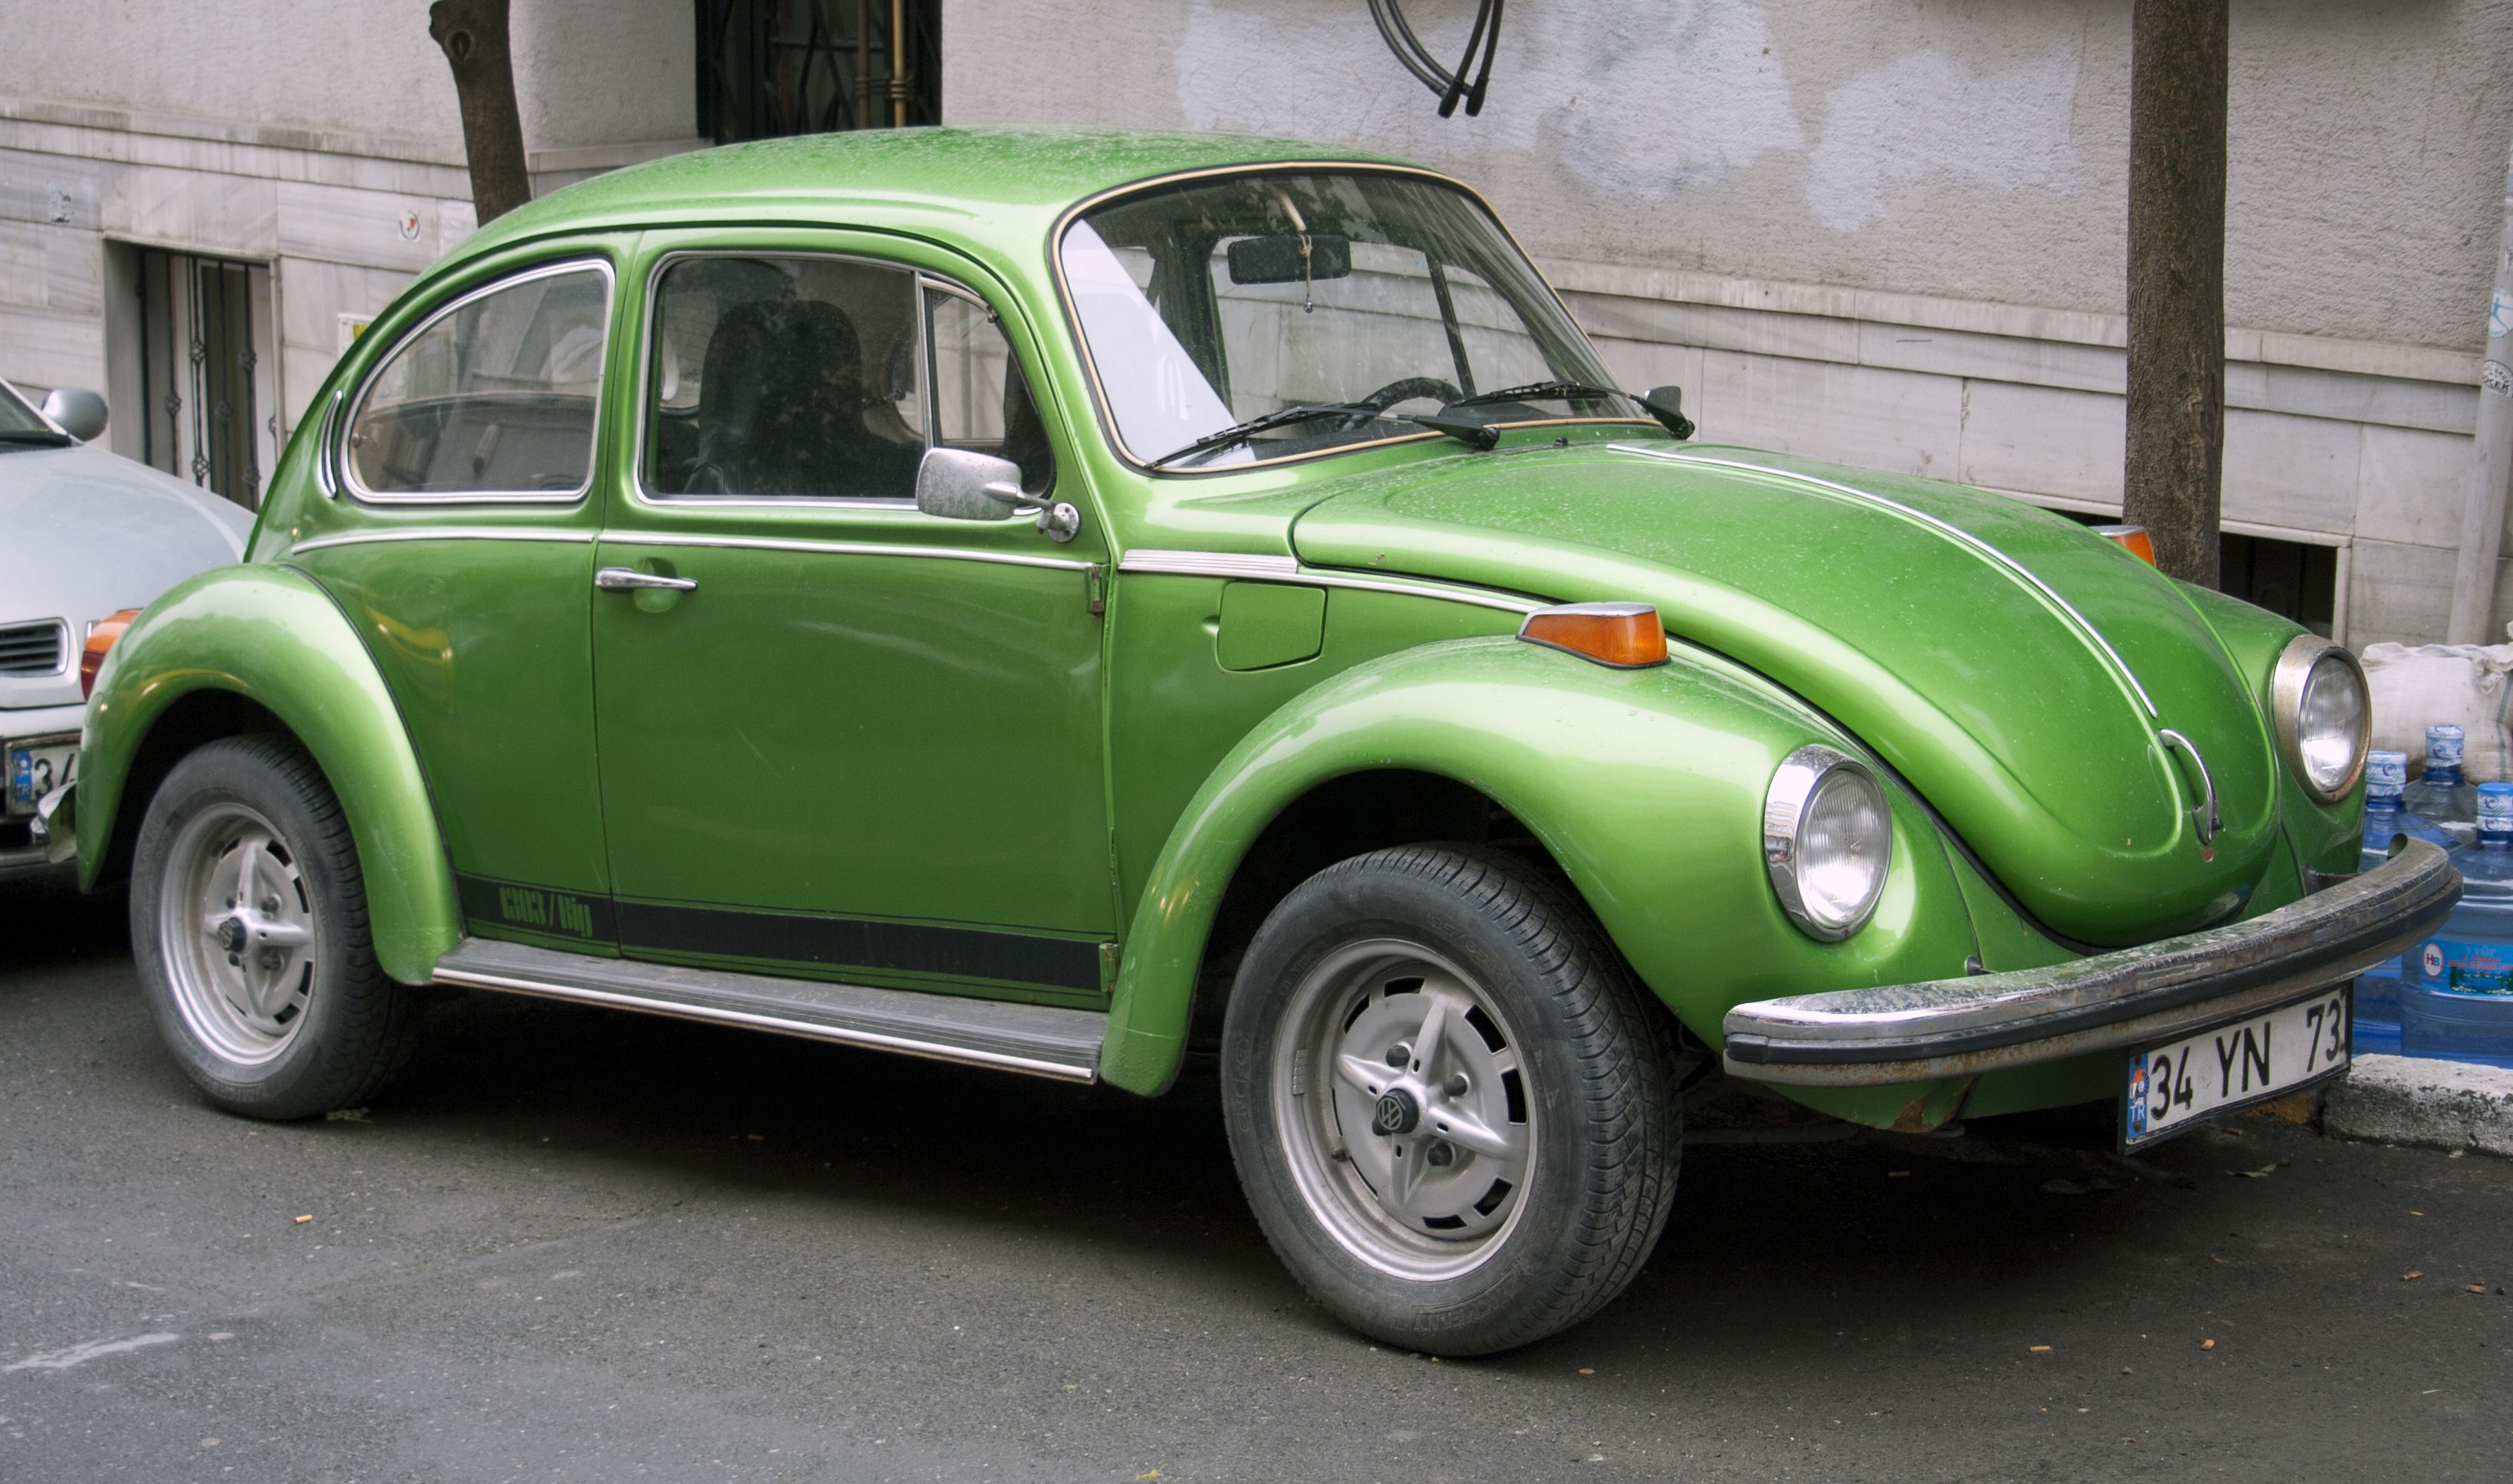 october tolbooms s bugs air volkswagen under tolboom beetle the rain bug ride bagged rick stanceworks